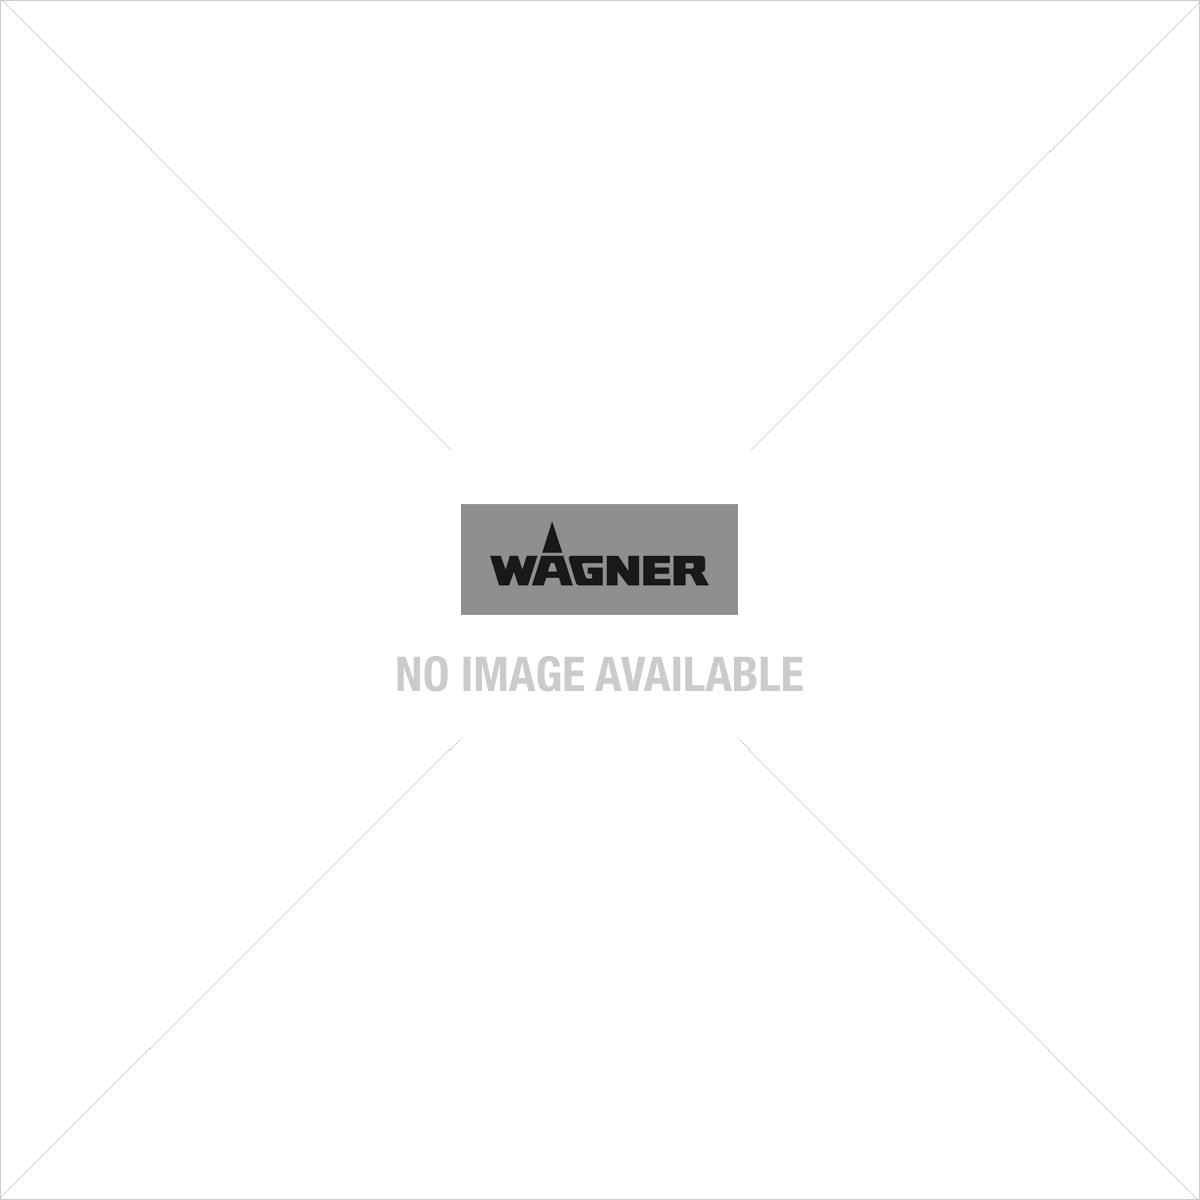 Wagner FineCoat 9900 HVLP - pistolet à peinture, basse pression